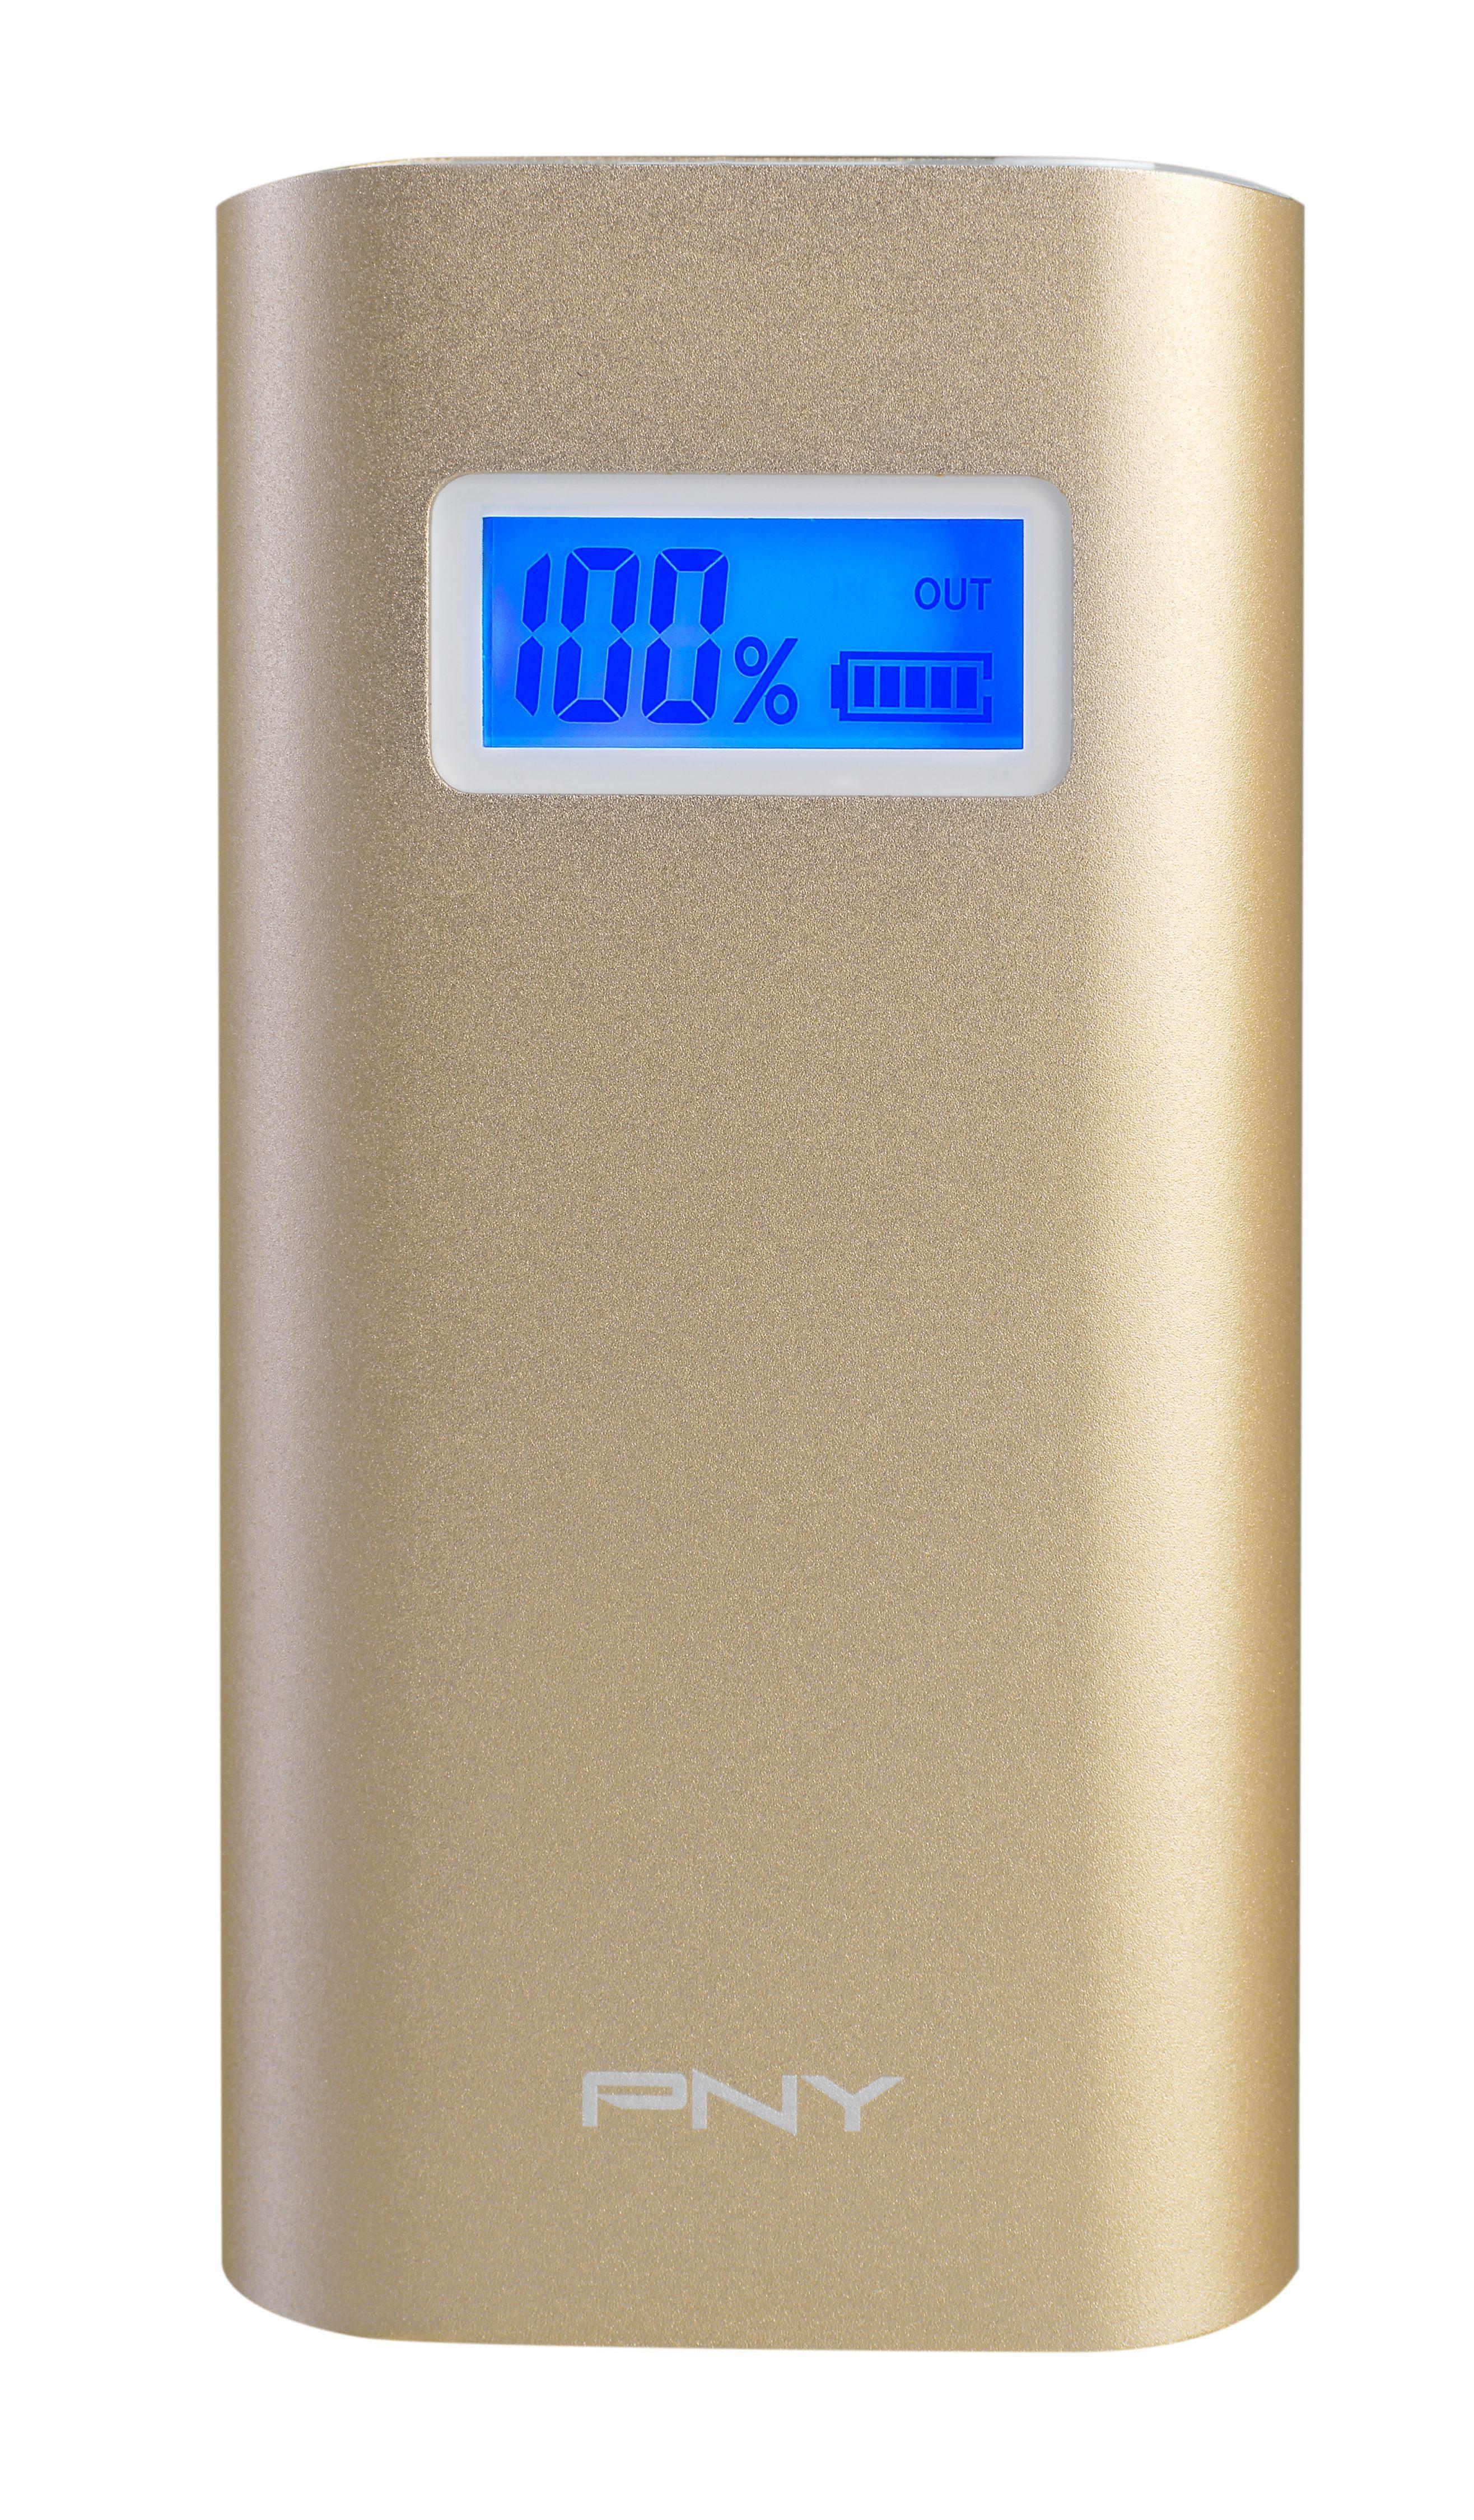 PNY mobile Powerbank »Powerpack Alu Digital 5200 gold«